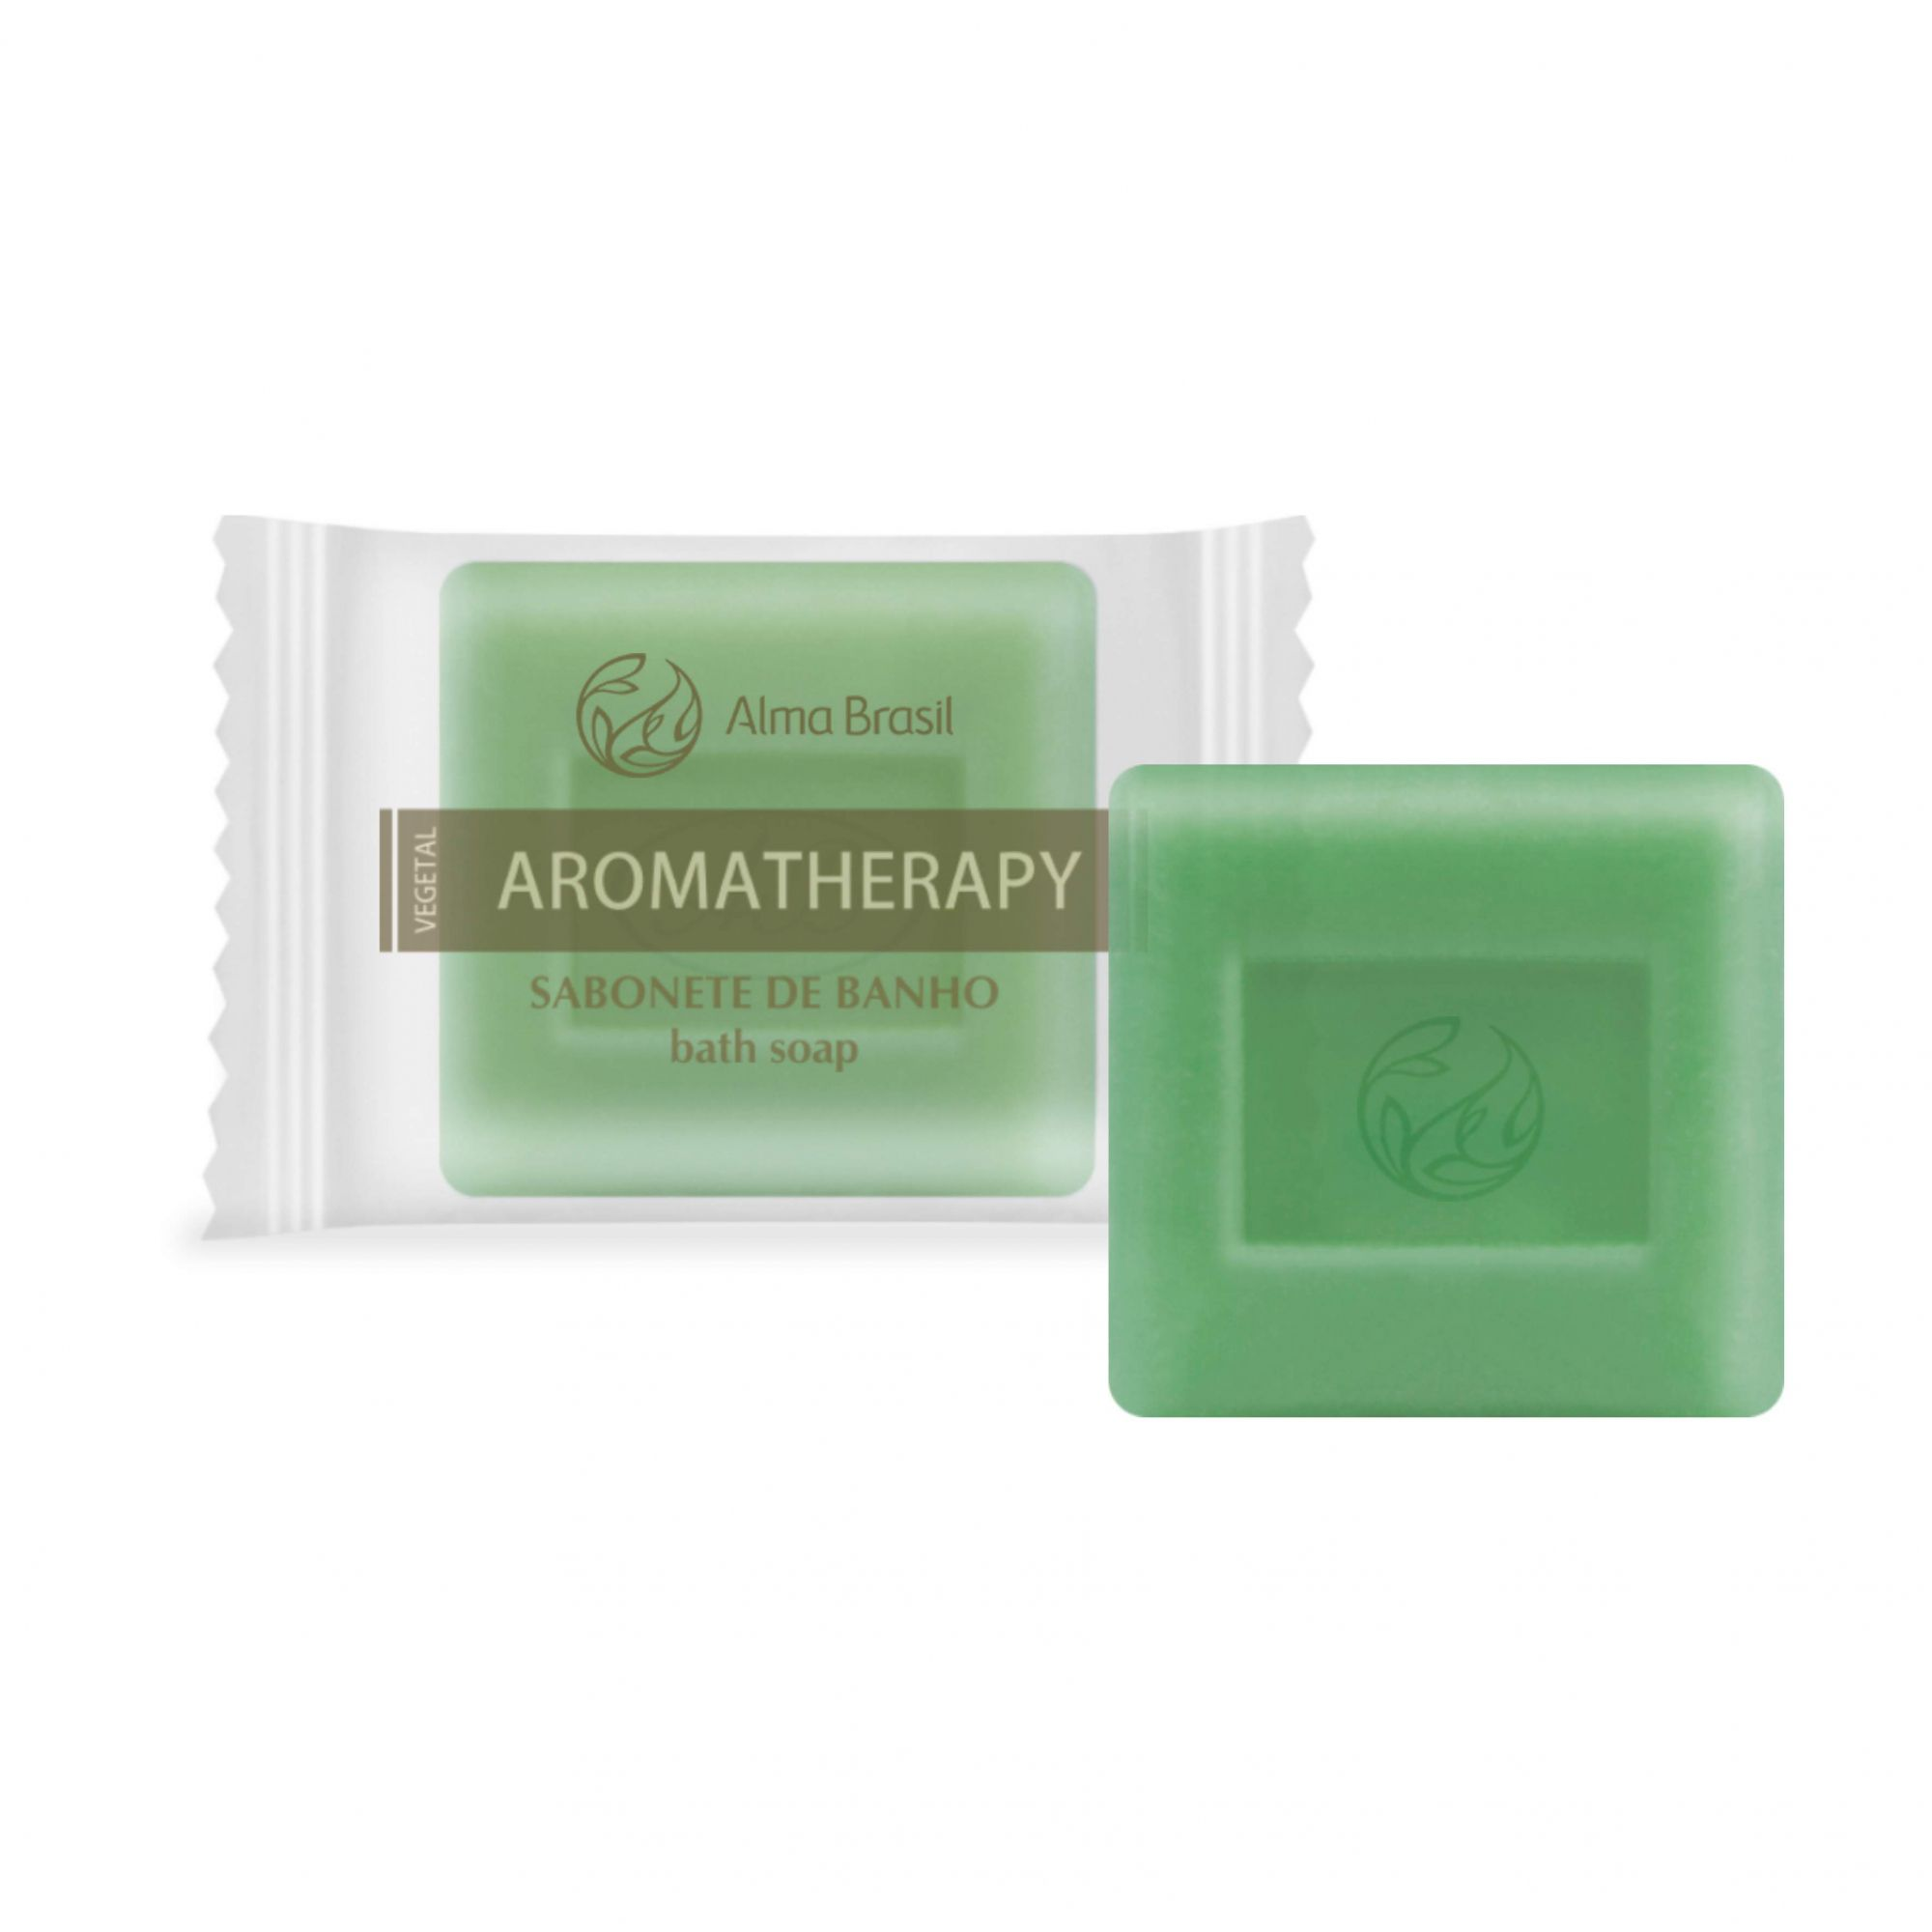 Sabonete 100% vegetal Aromatherapy 60g  - Alma Brasil Cosméticos